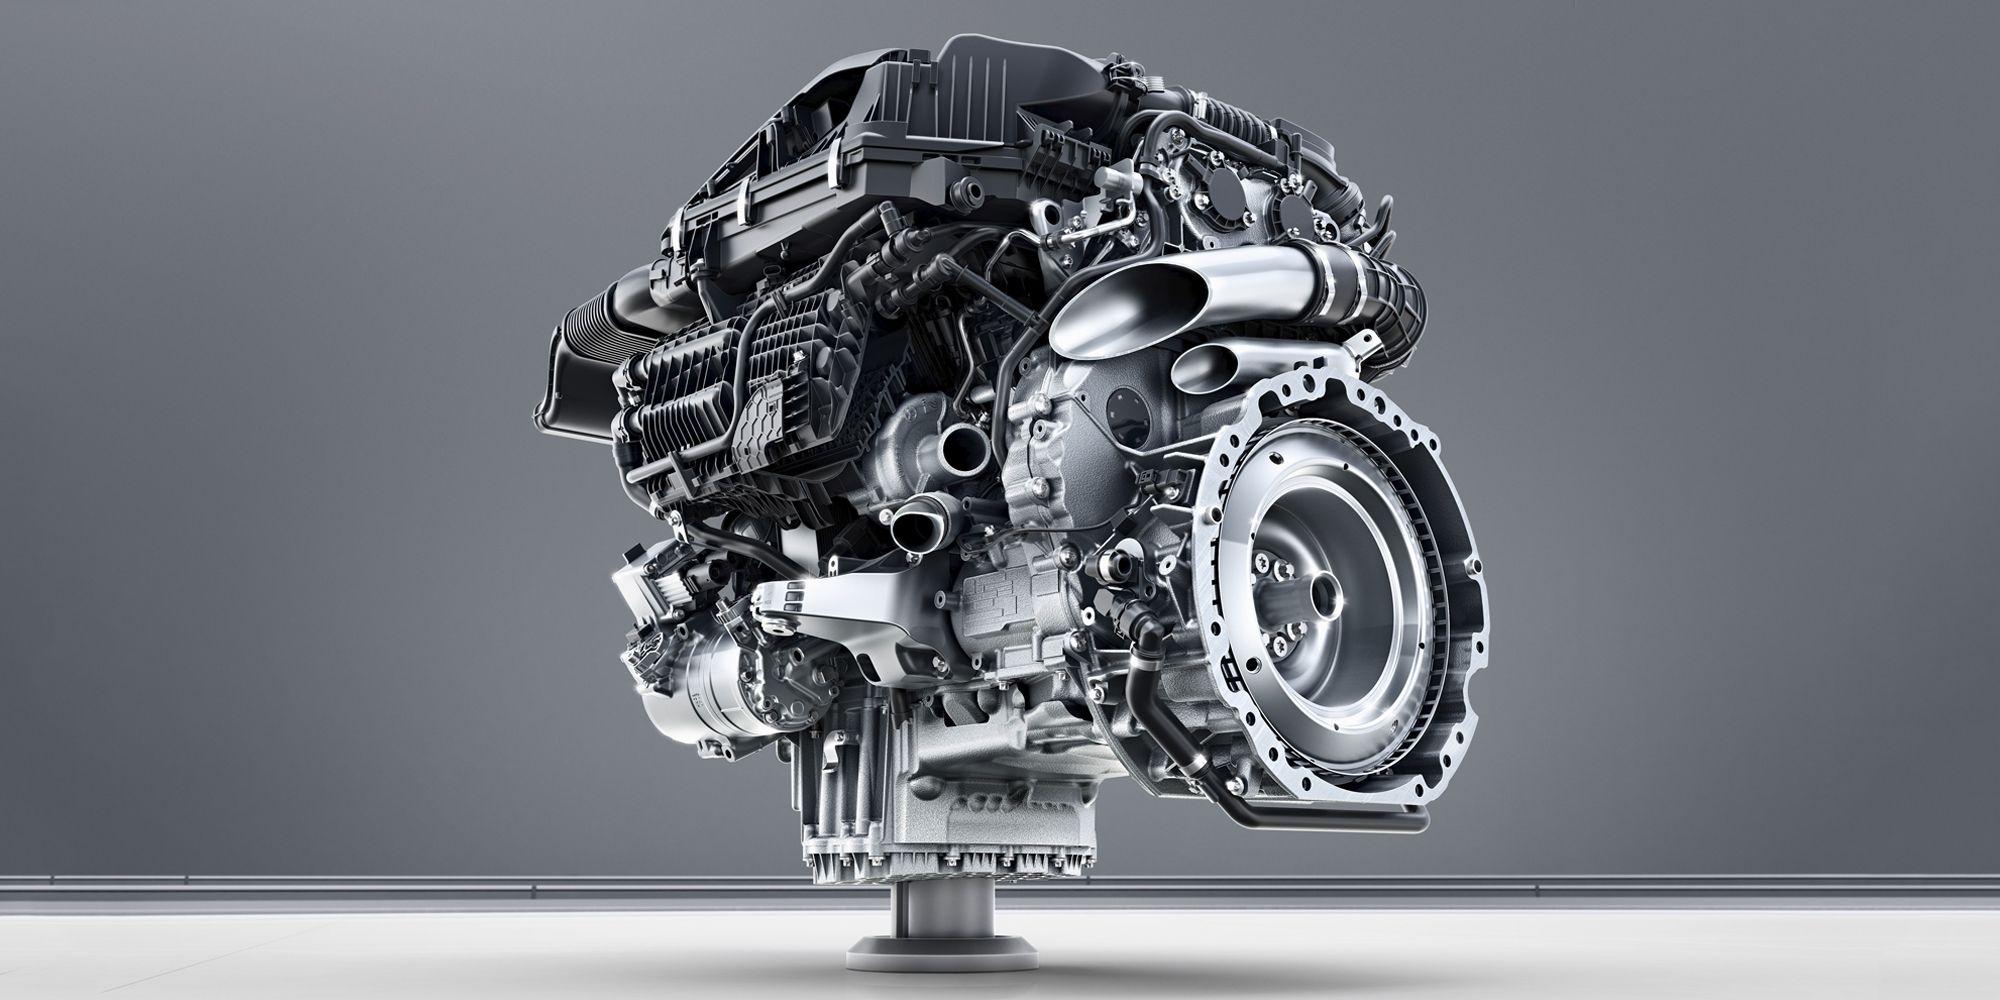 hight resolution of 429 cadillac engine diagram